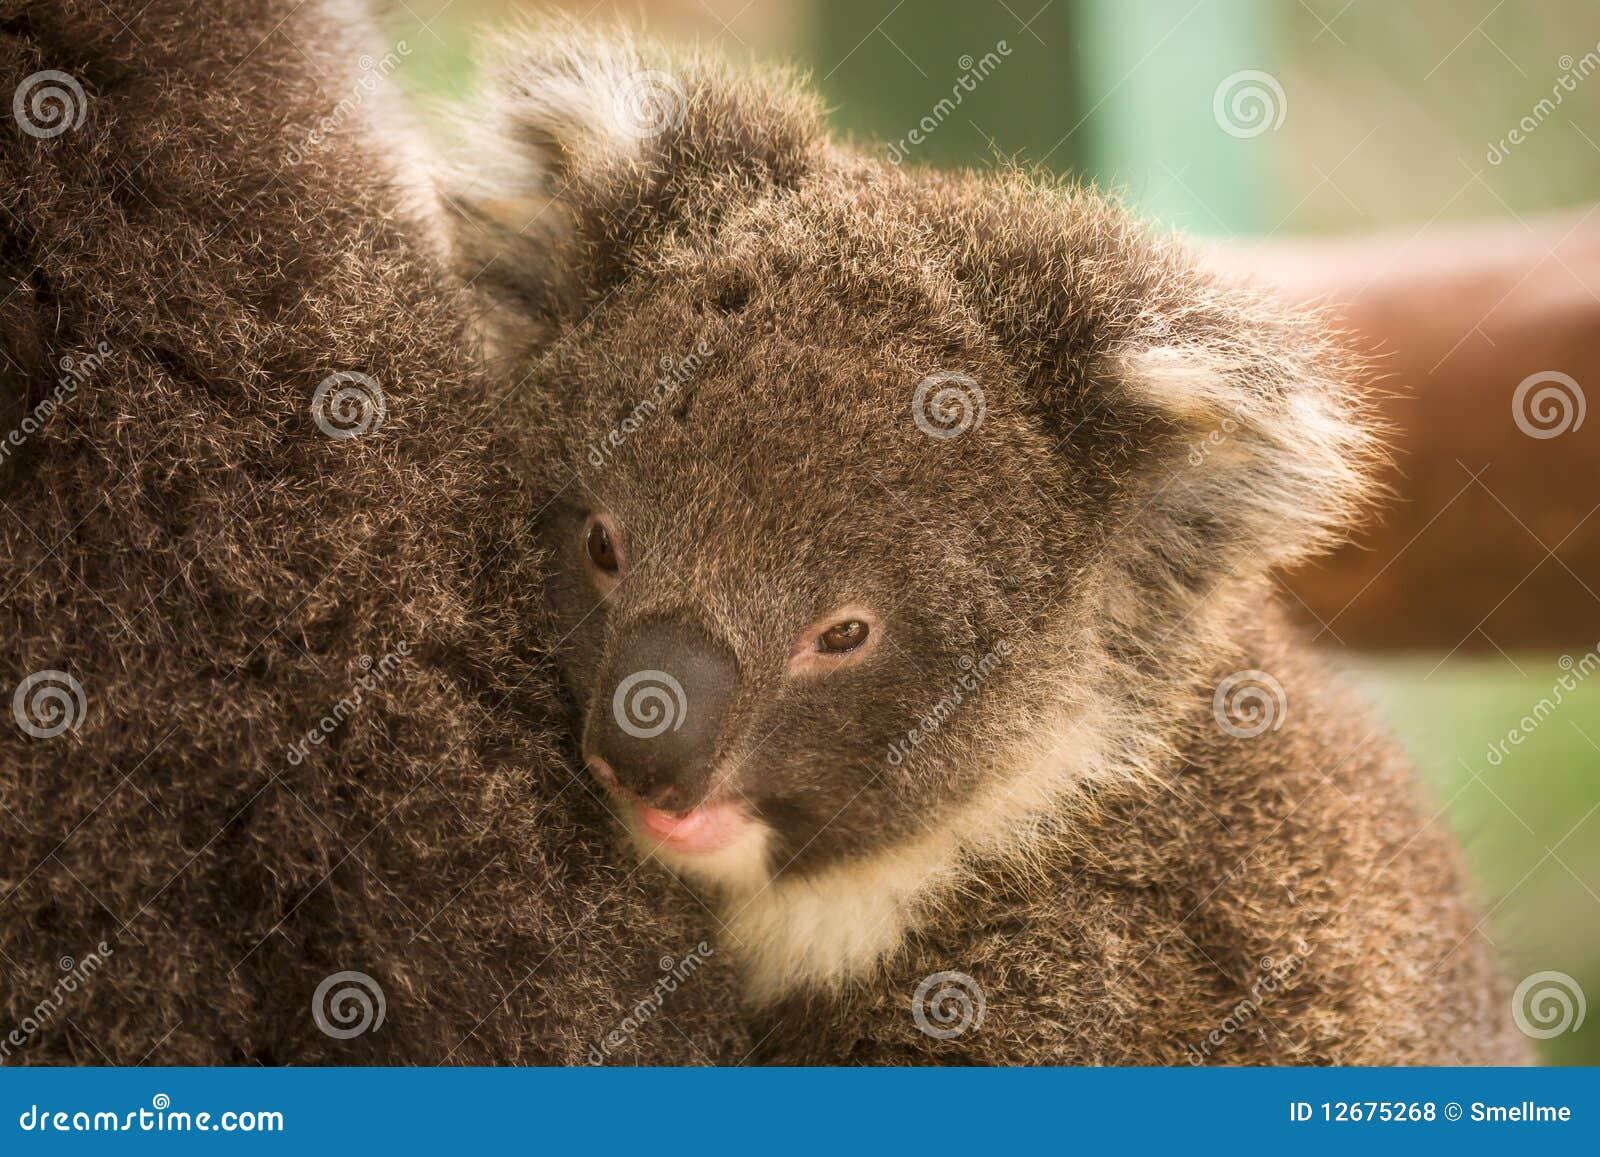 Koala baby